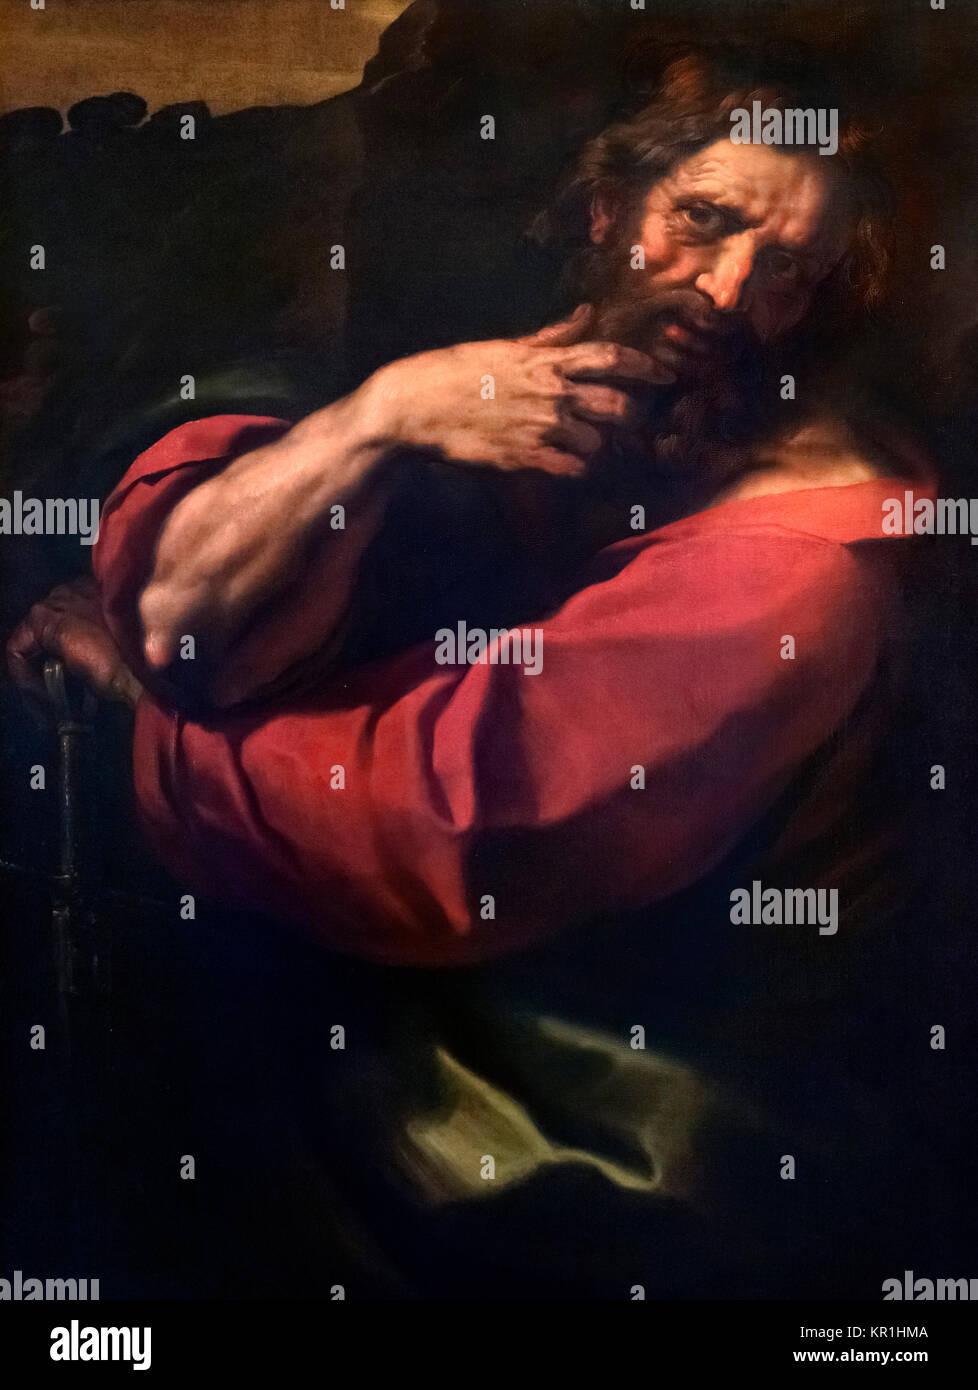 St Paul the Apostle by Giulio Cesare Procaccini (1574-1625), 1621 - Stock Image